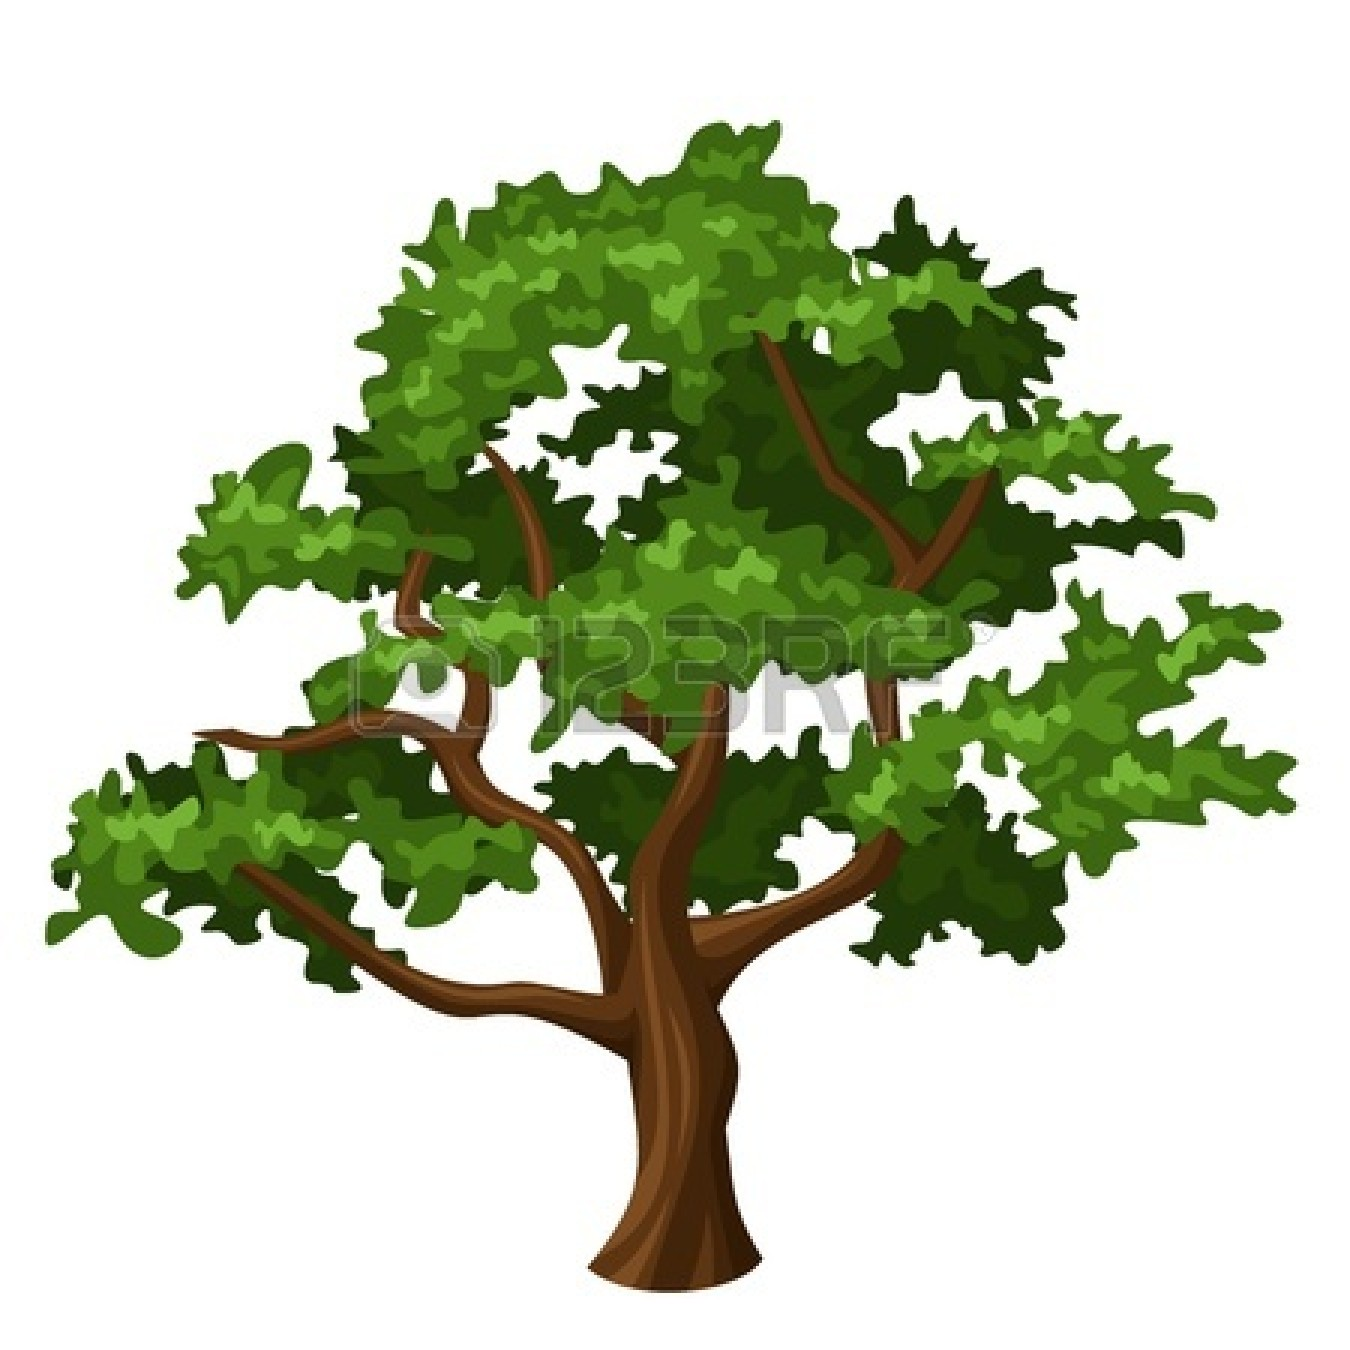 Tree clipart oak. Trees panda free images